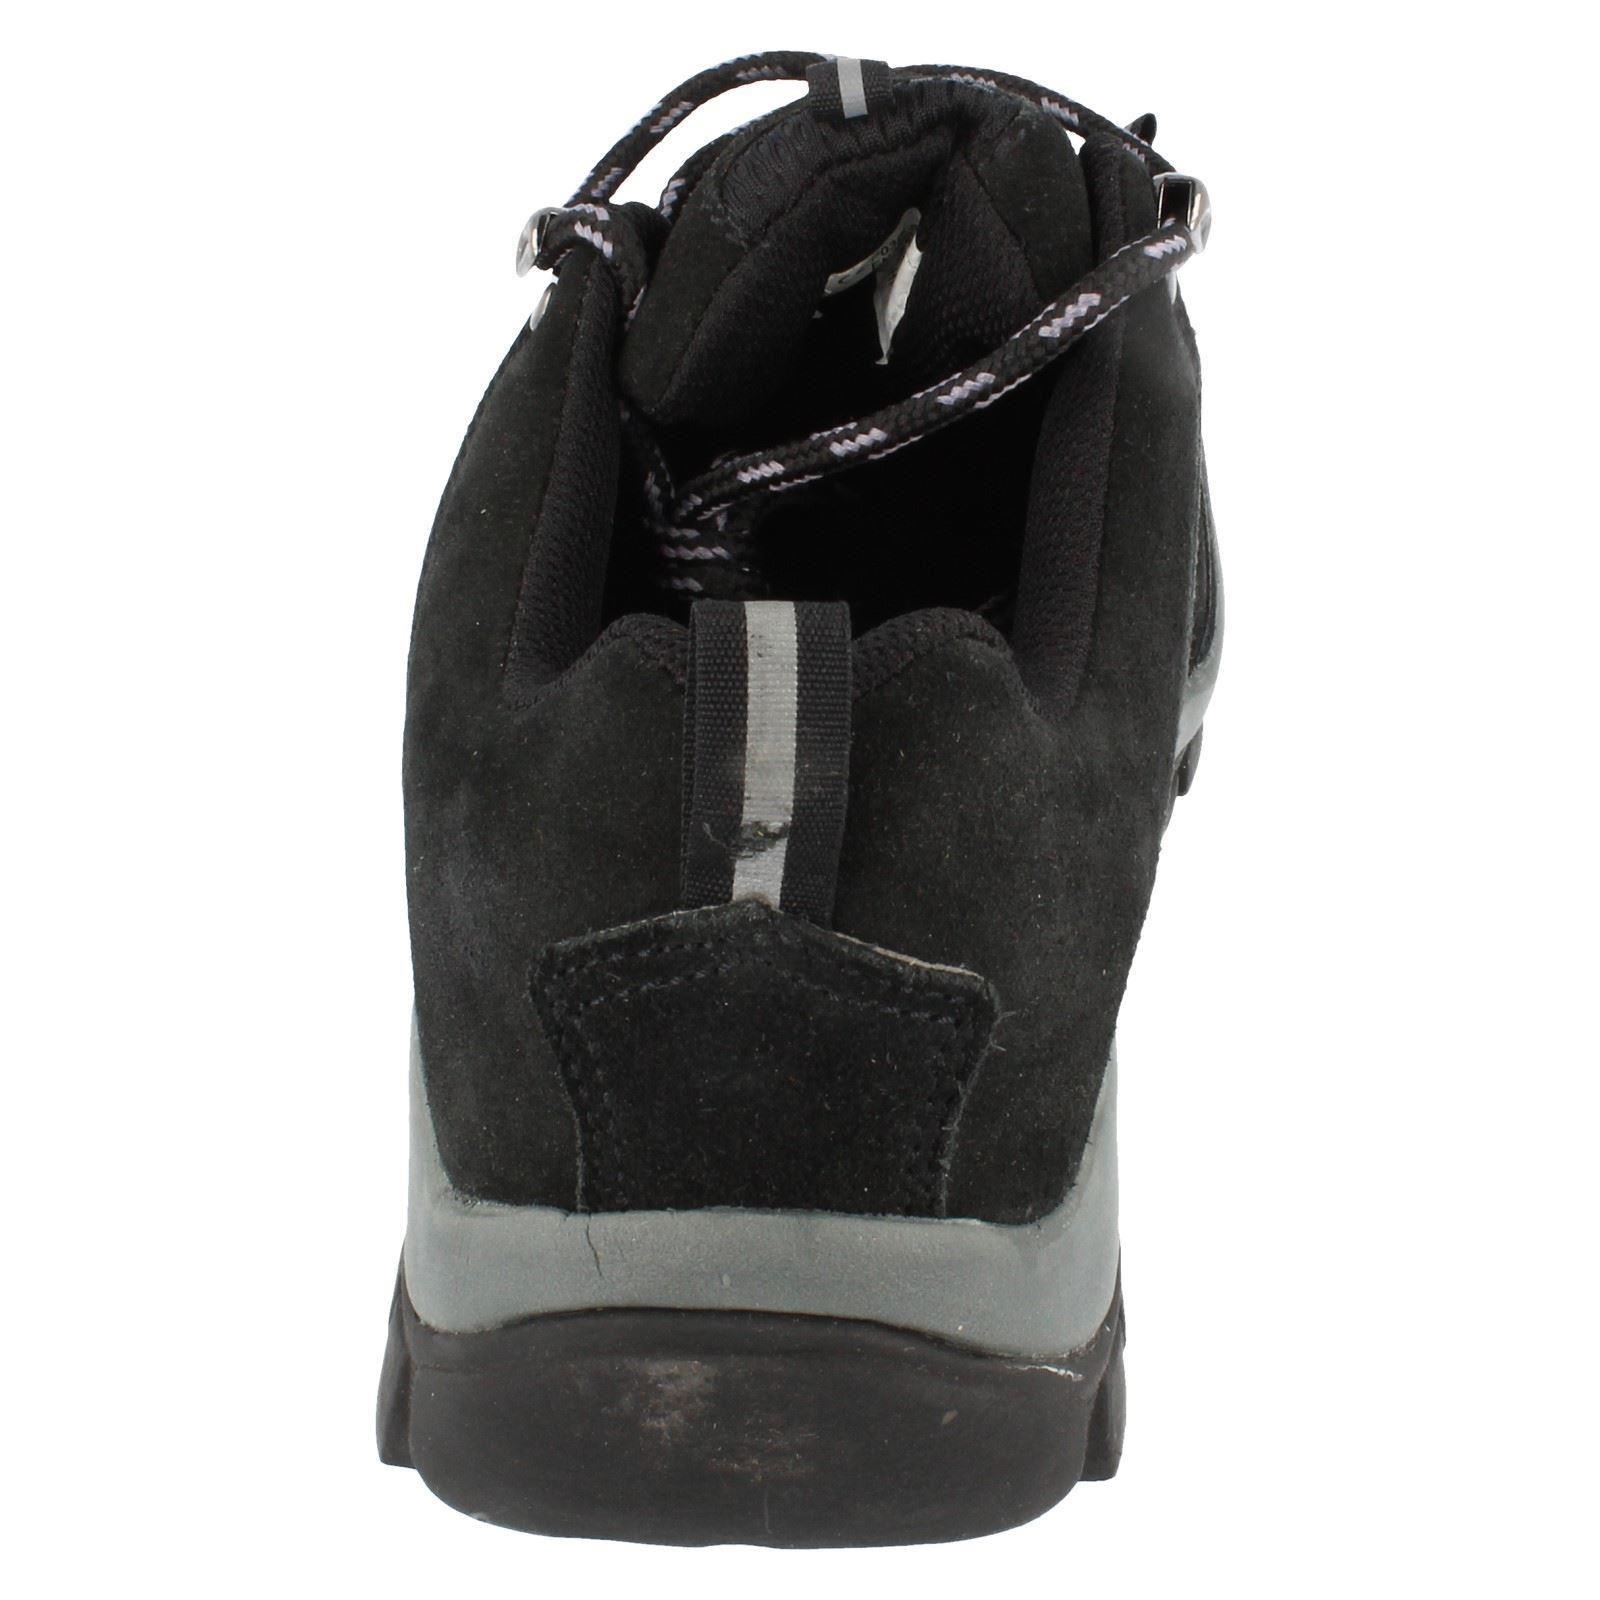 Truka trainer pour homme steel toe cap trainer Truka A2051 ~ n fe41b1